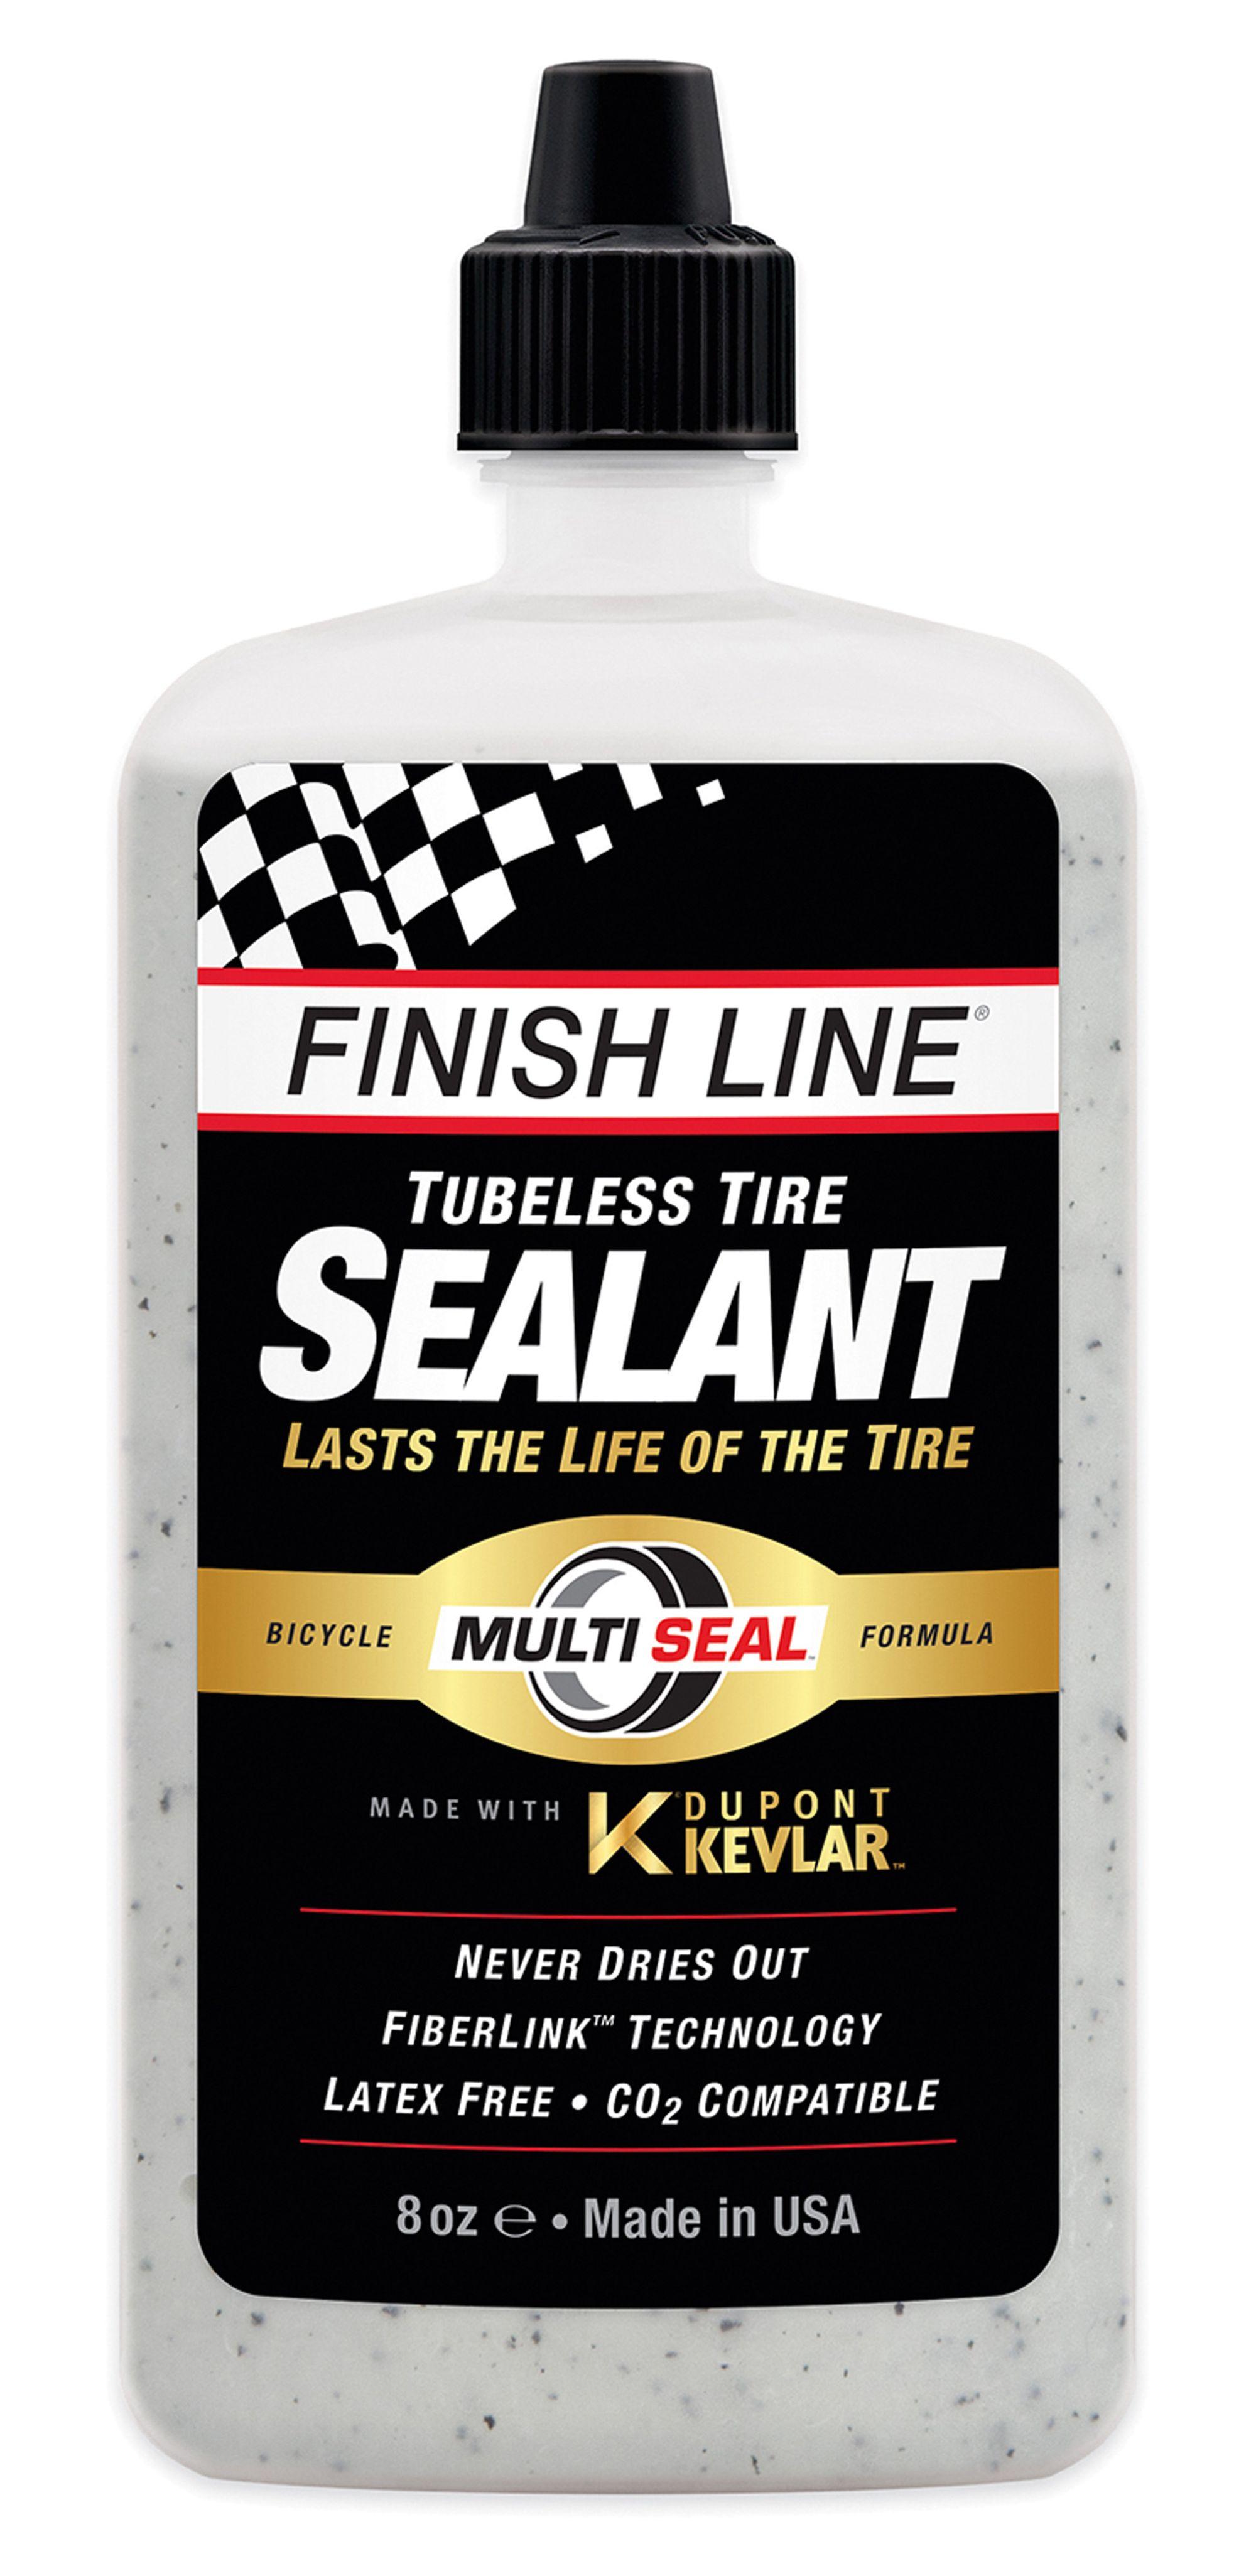 Finish Line Tubeless Tire Sealant